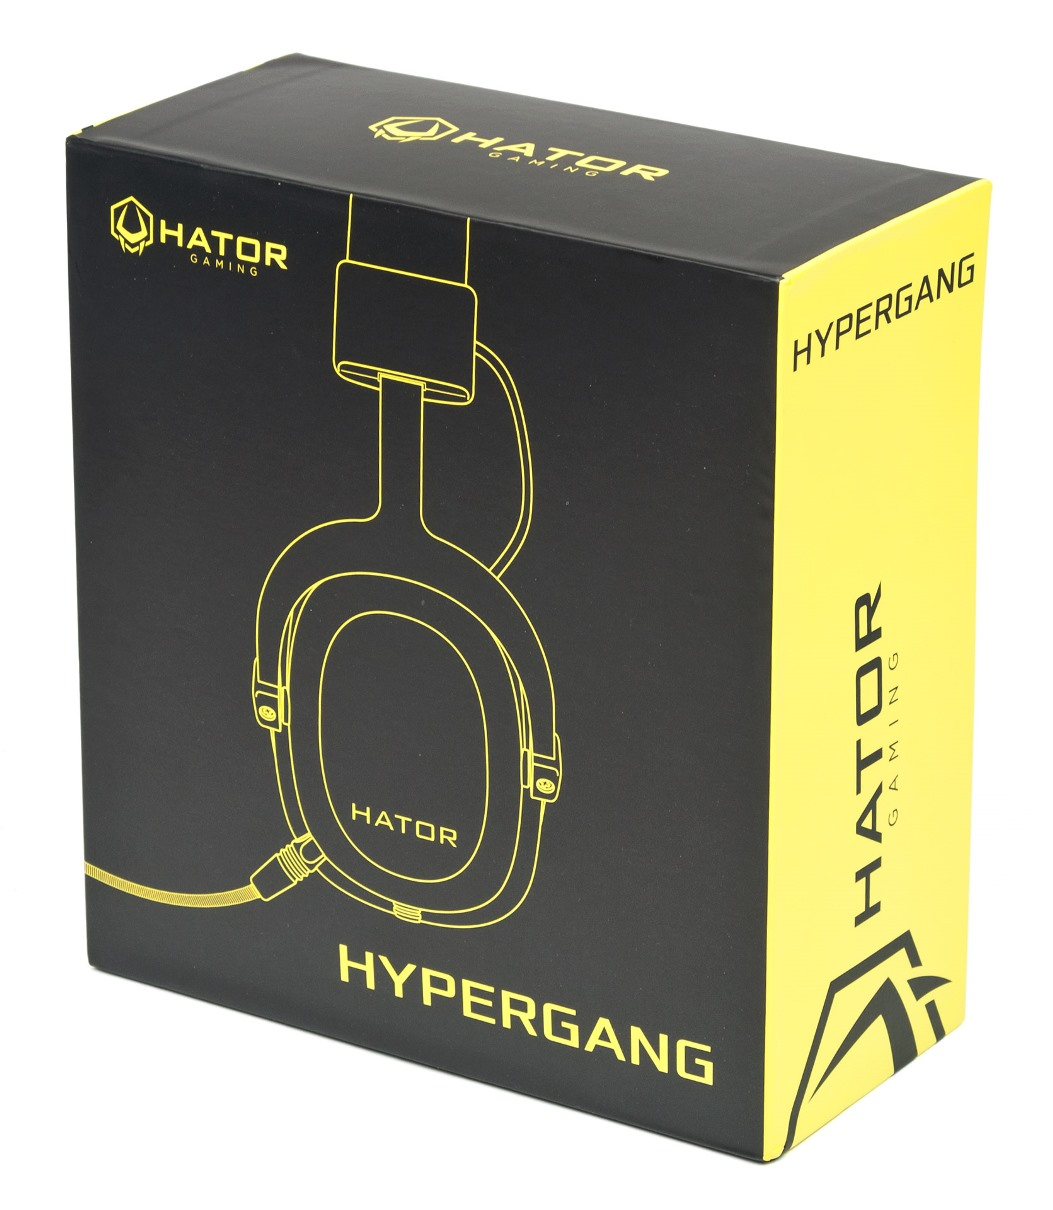 Hator Hypergang упаковка